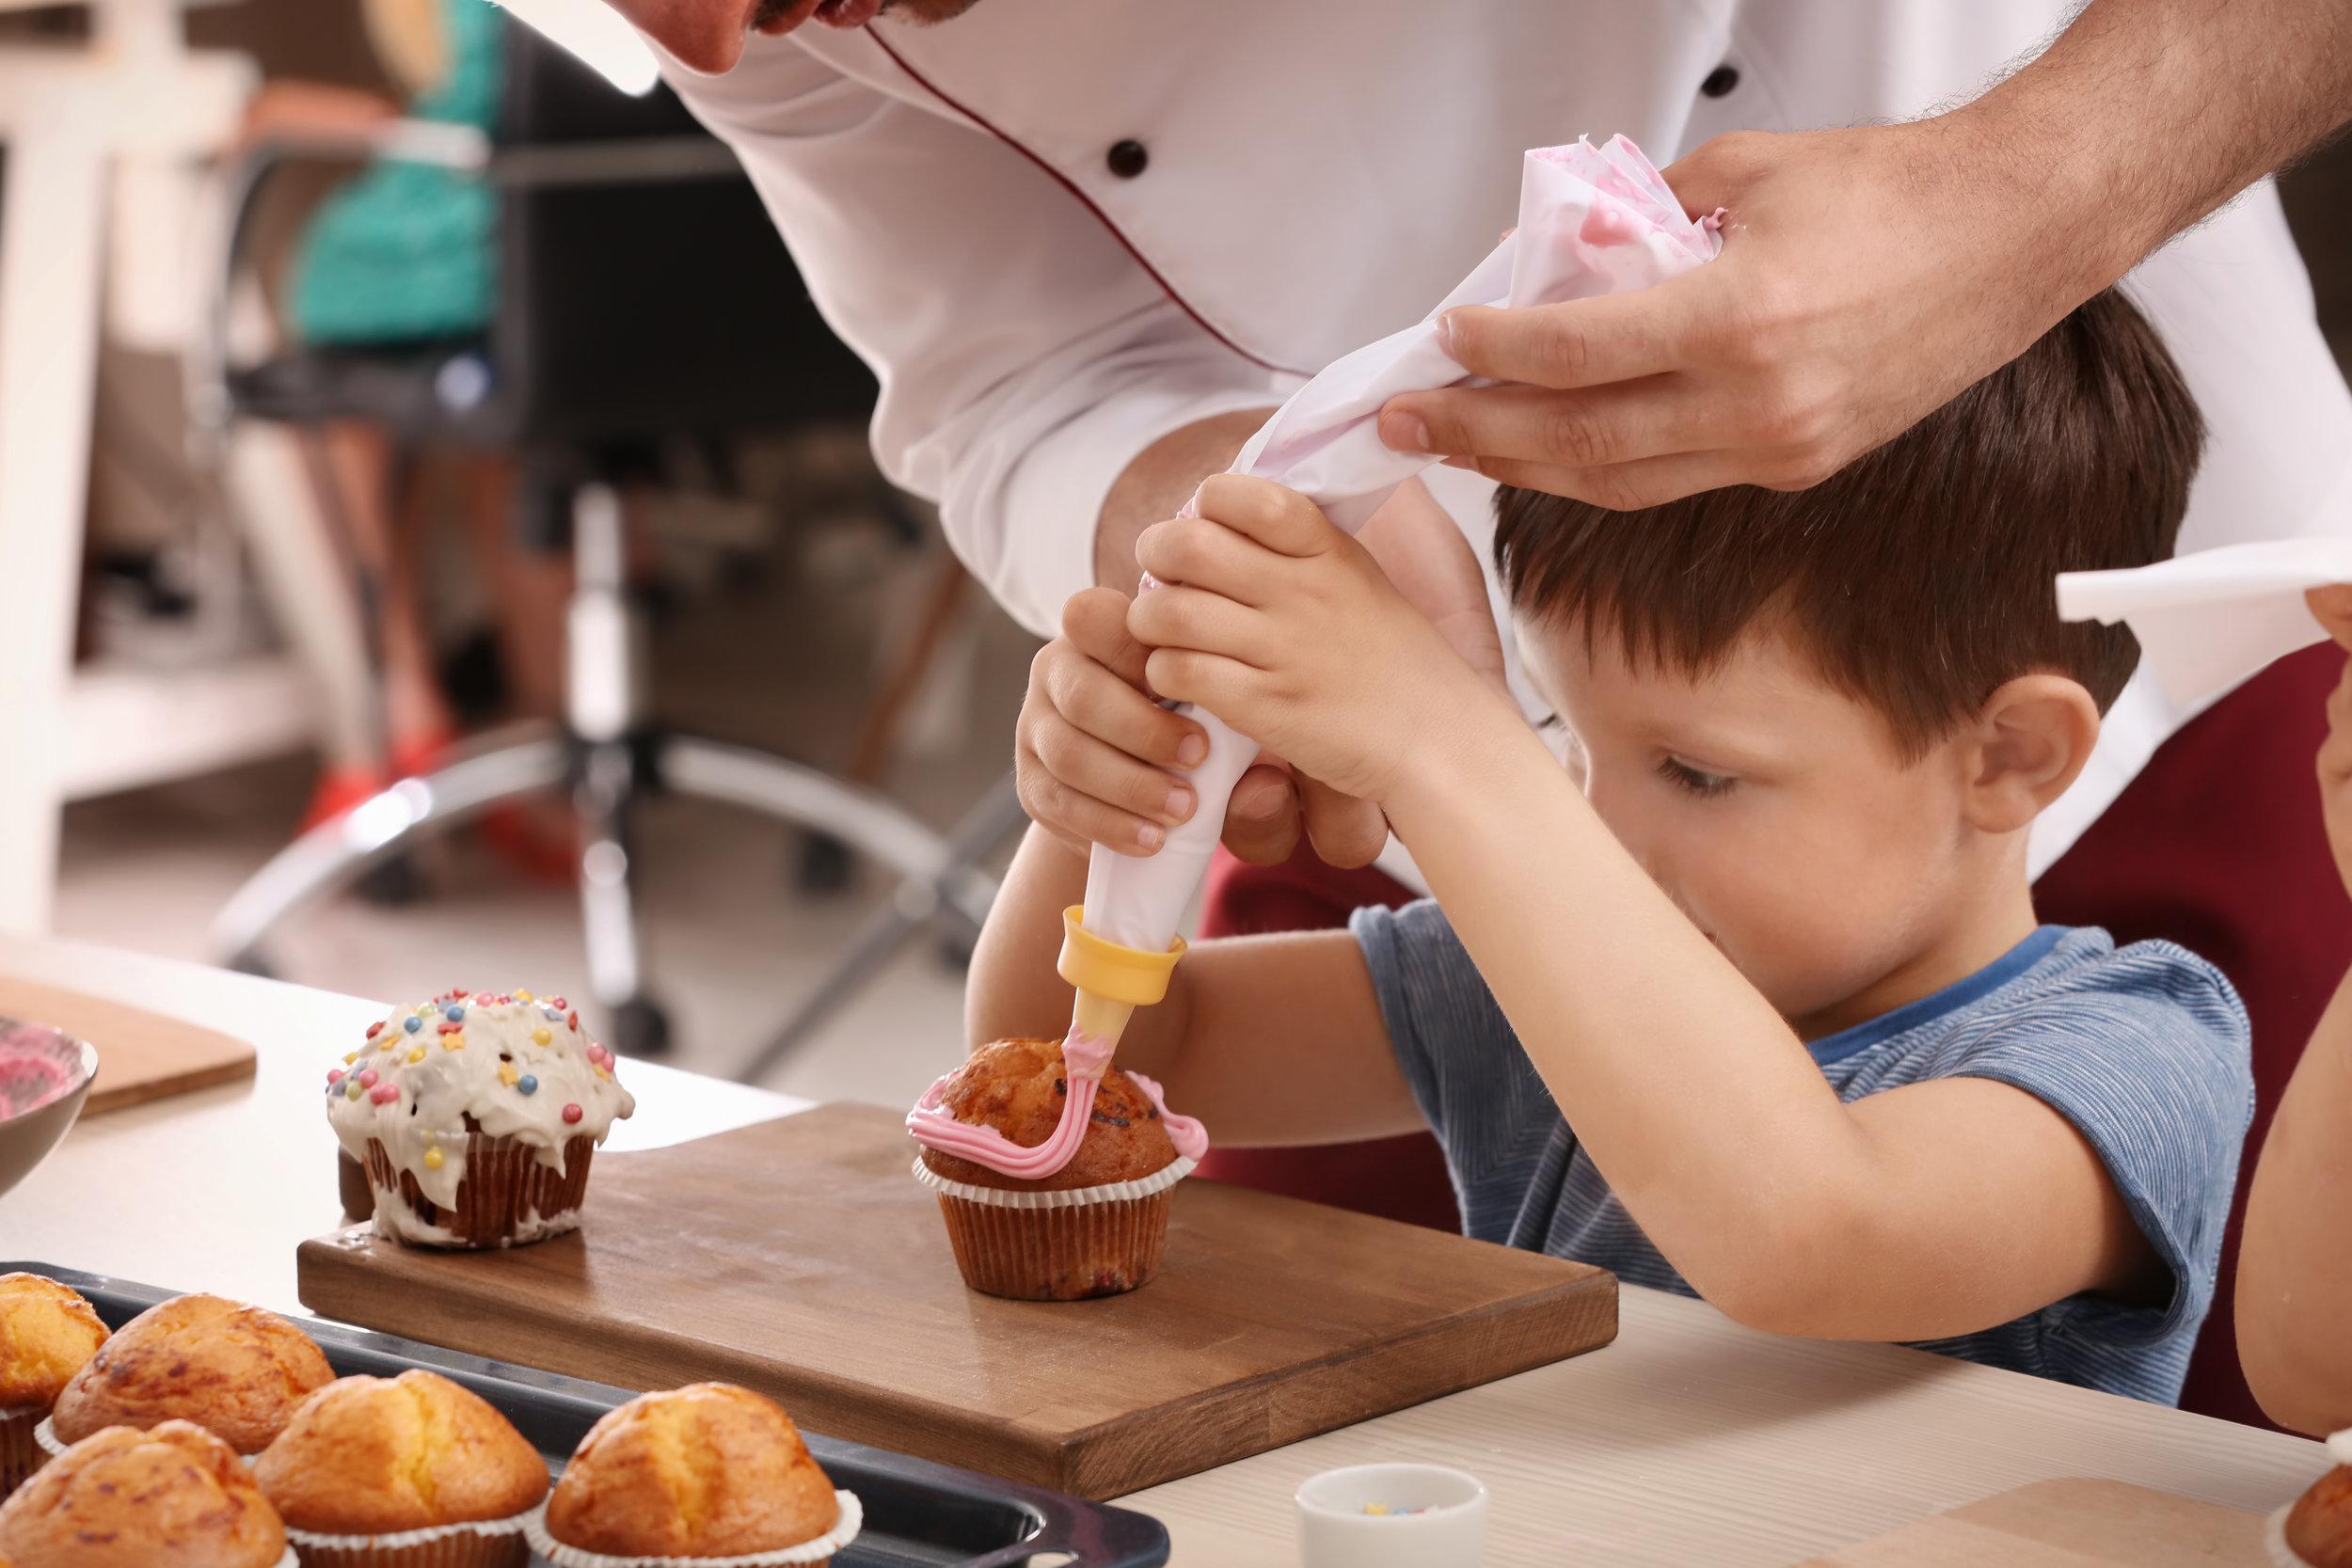 Each day, preschool children help prepare snacks for tea time.